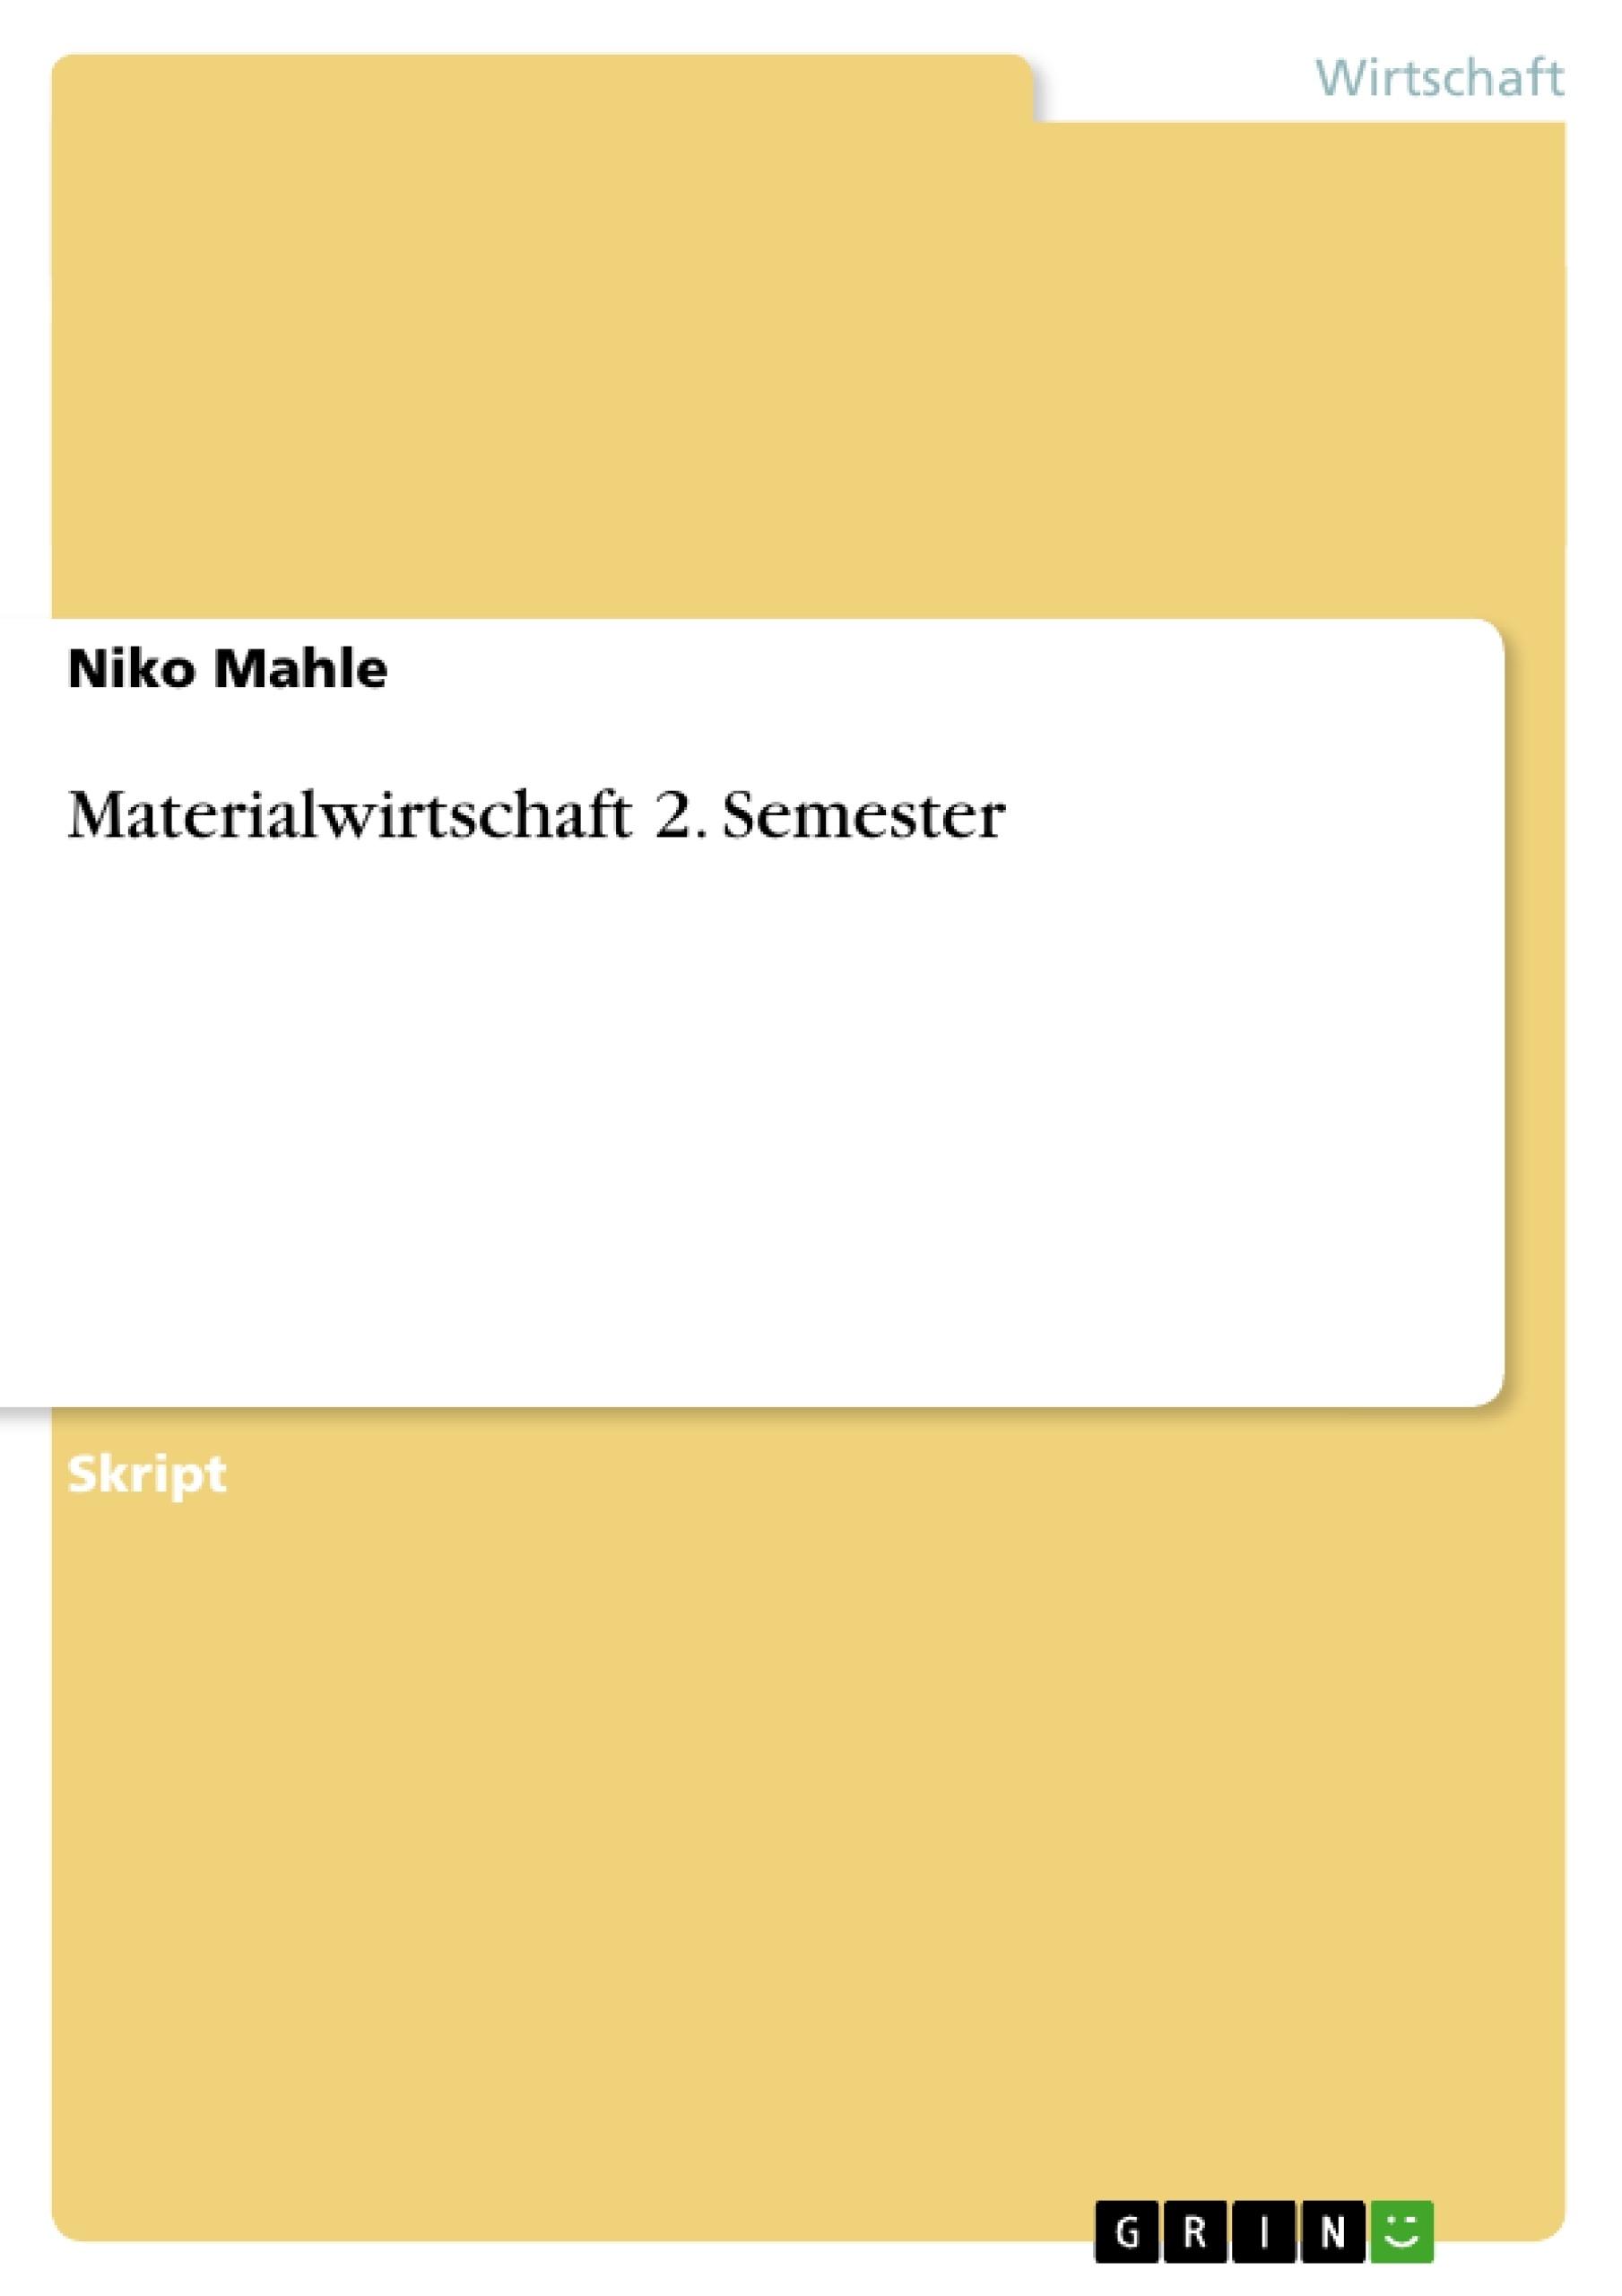 Titel: Materialwirtschaft 2. Semester